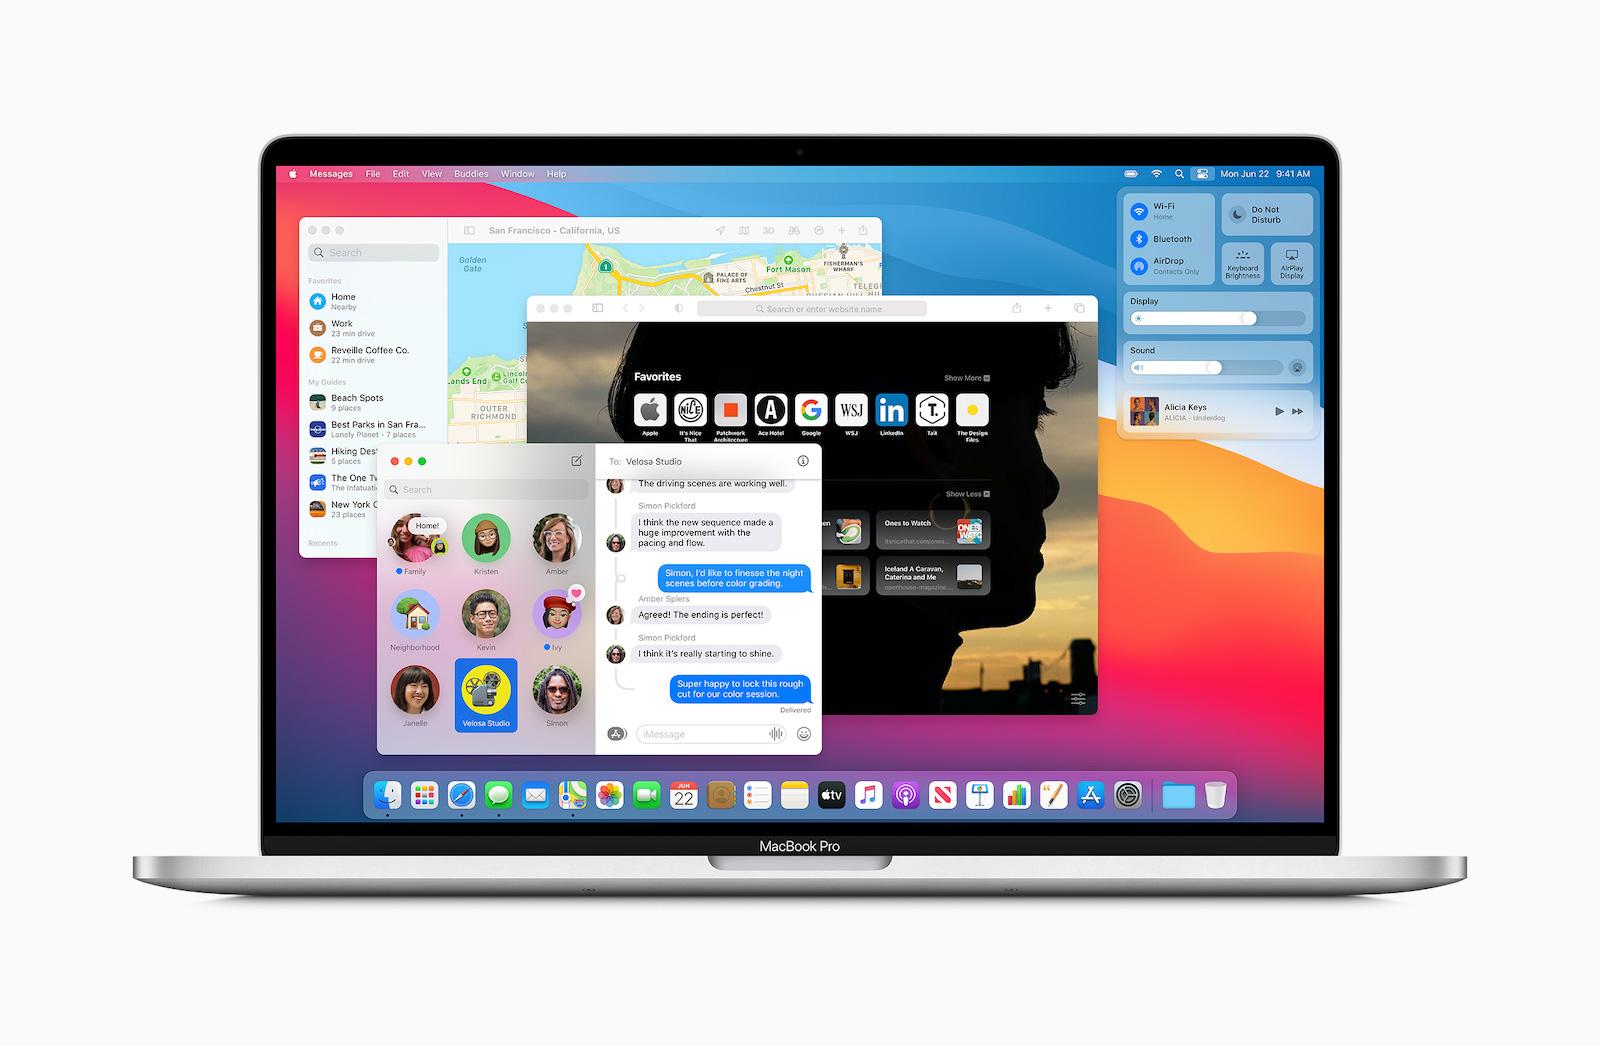 Apple macos bigsur redesignedapps 06222020